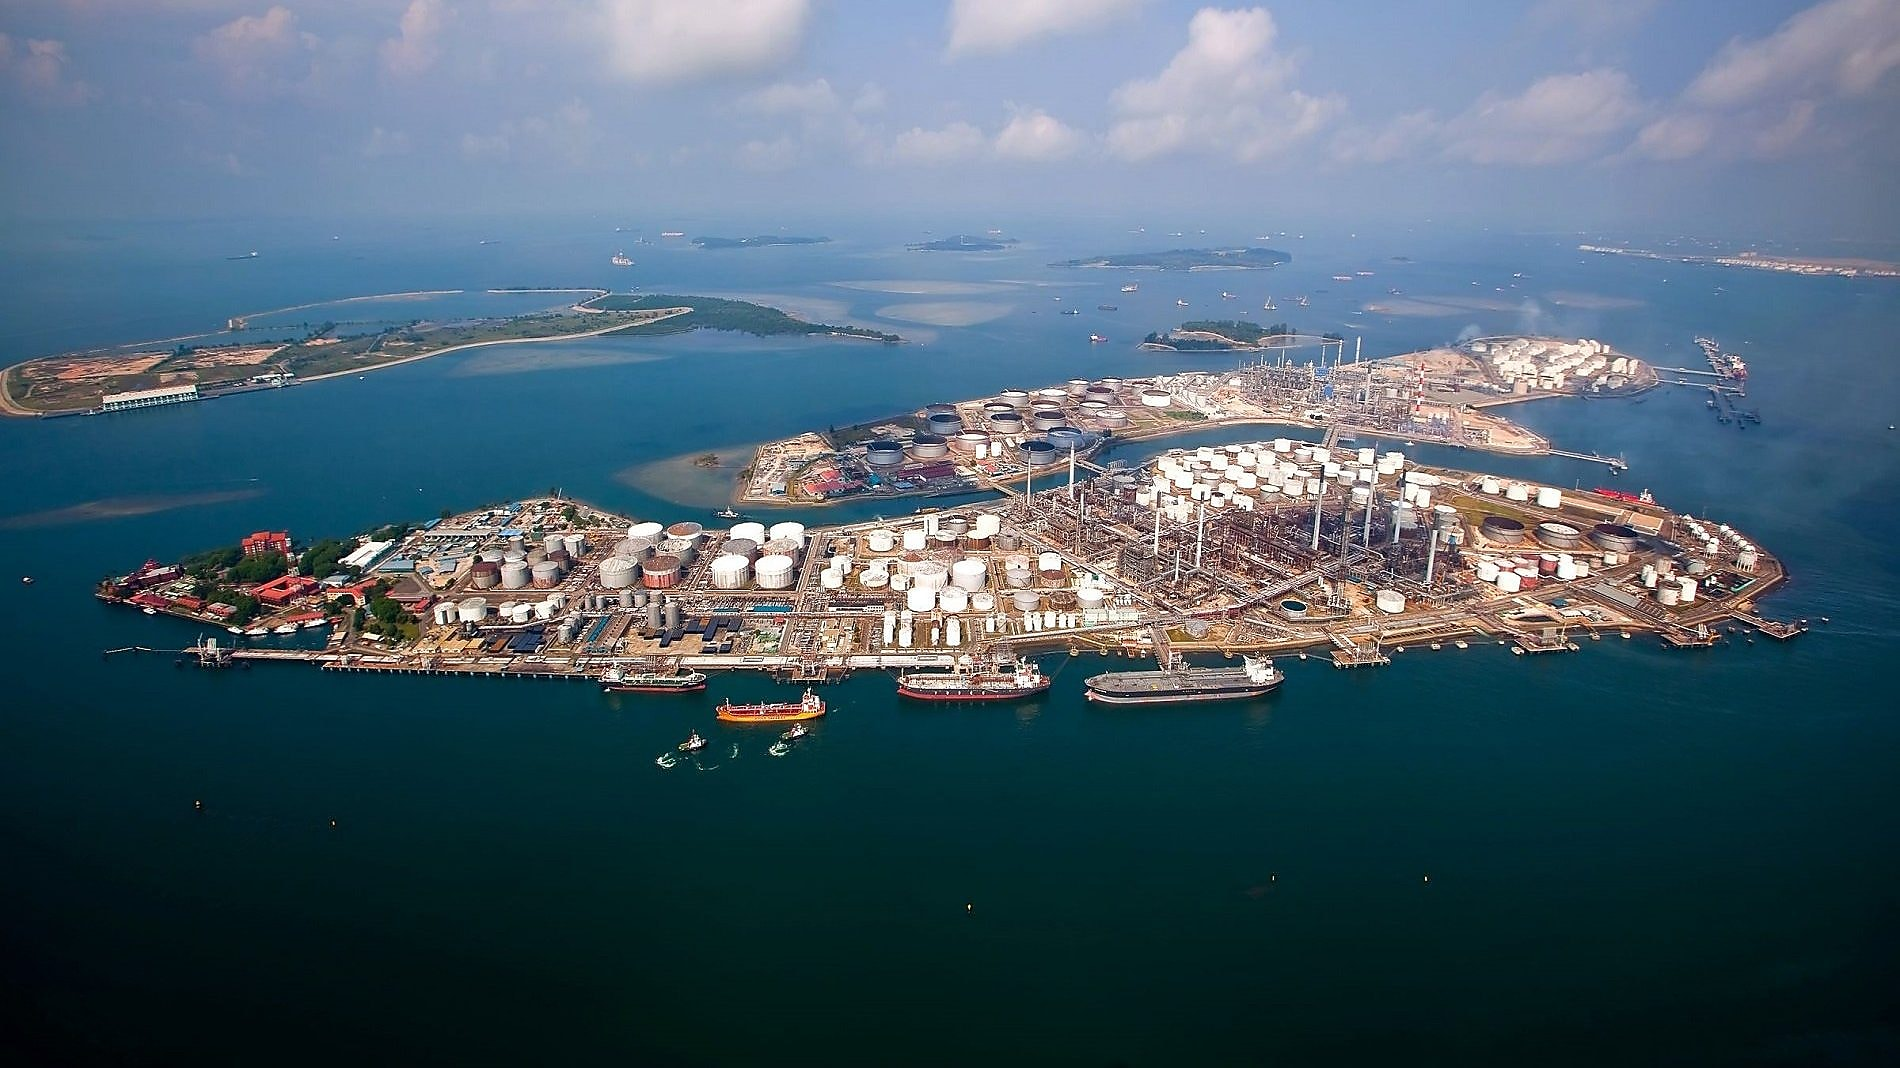 De Pulau Bukom-raffinaderij. (Foto Shell)